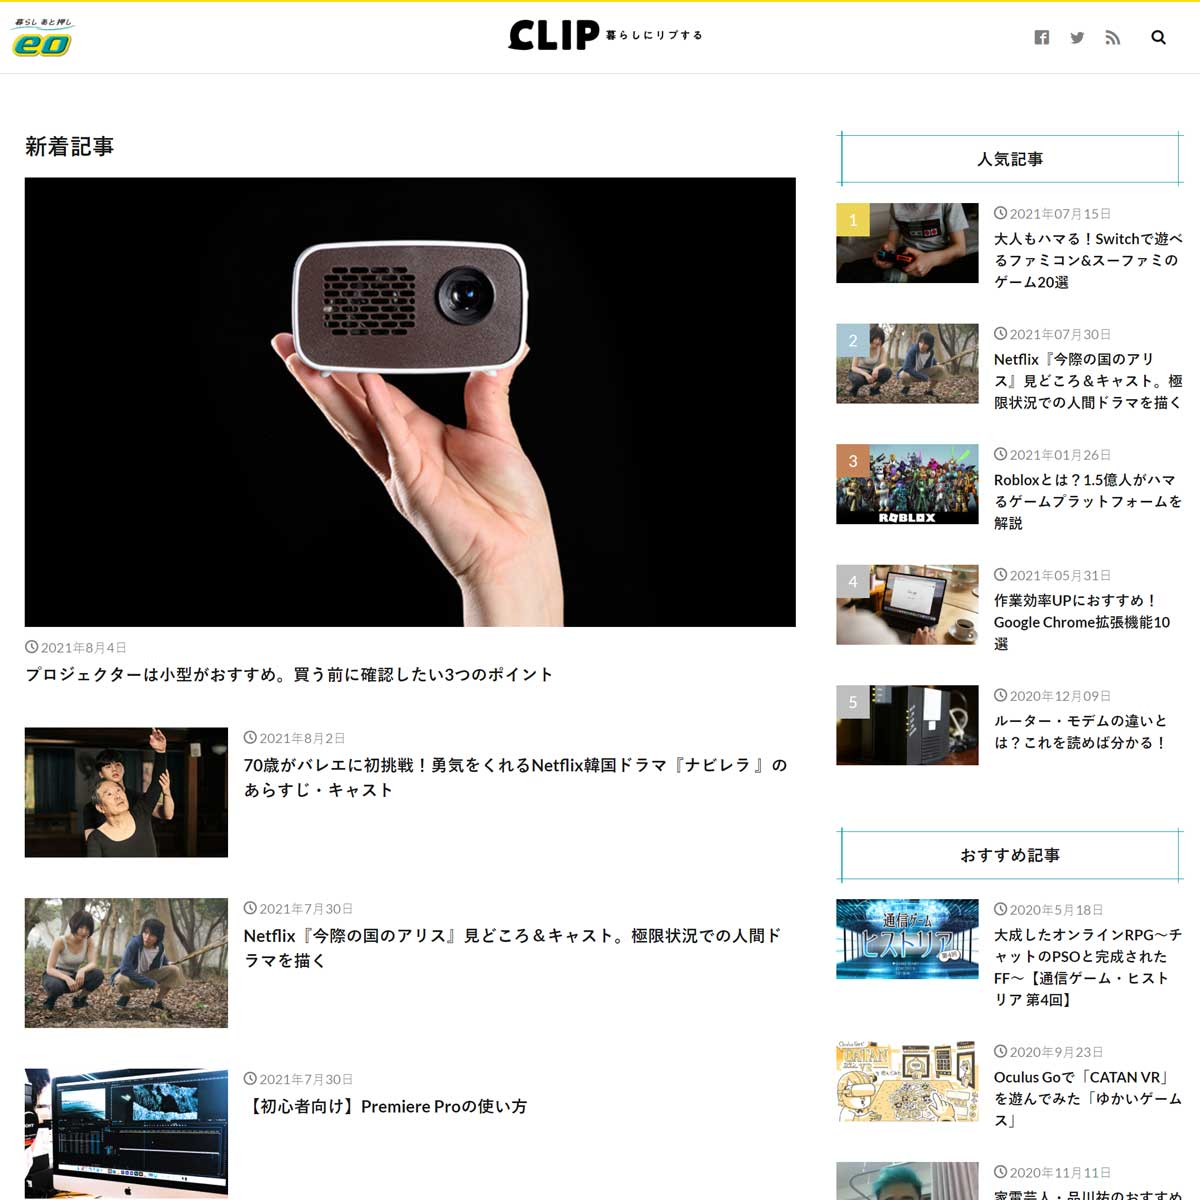 CLIP(株式会社オプテージ)